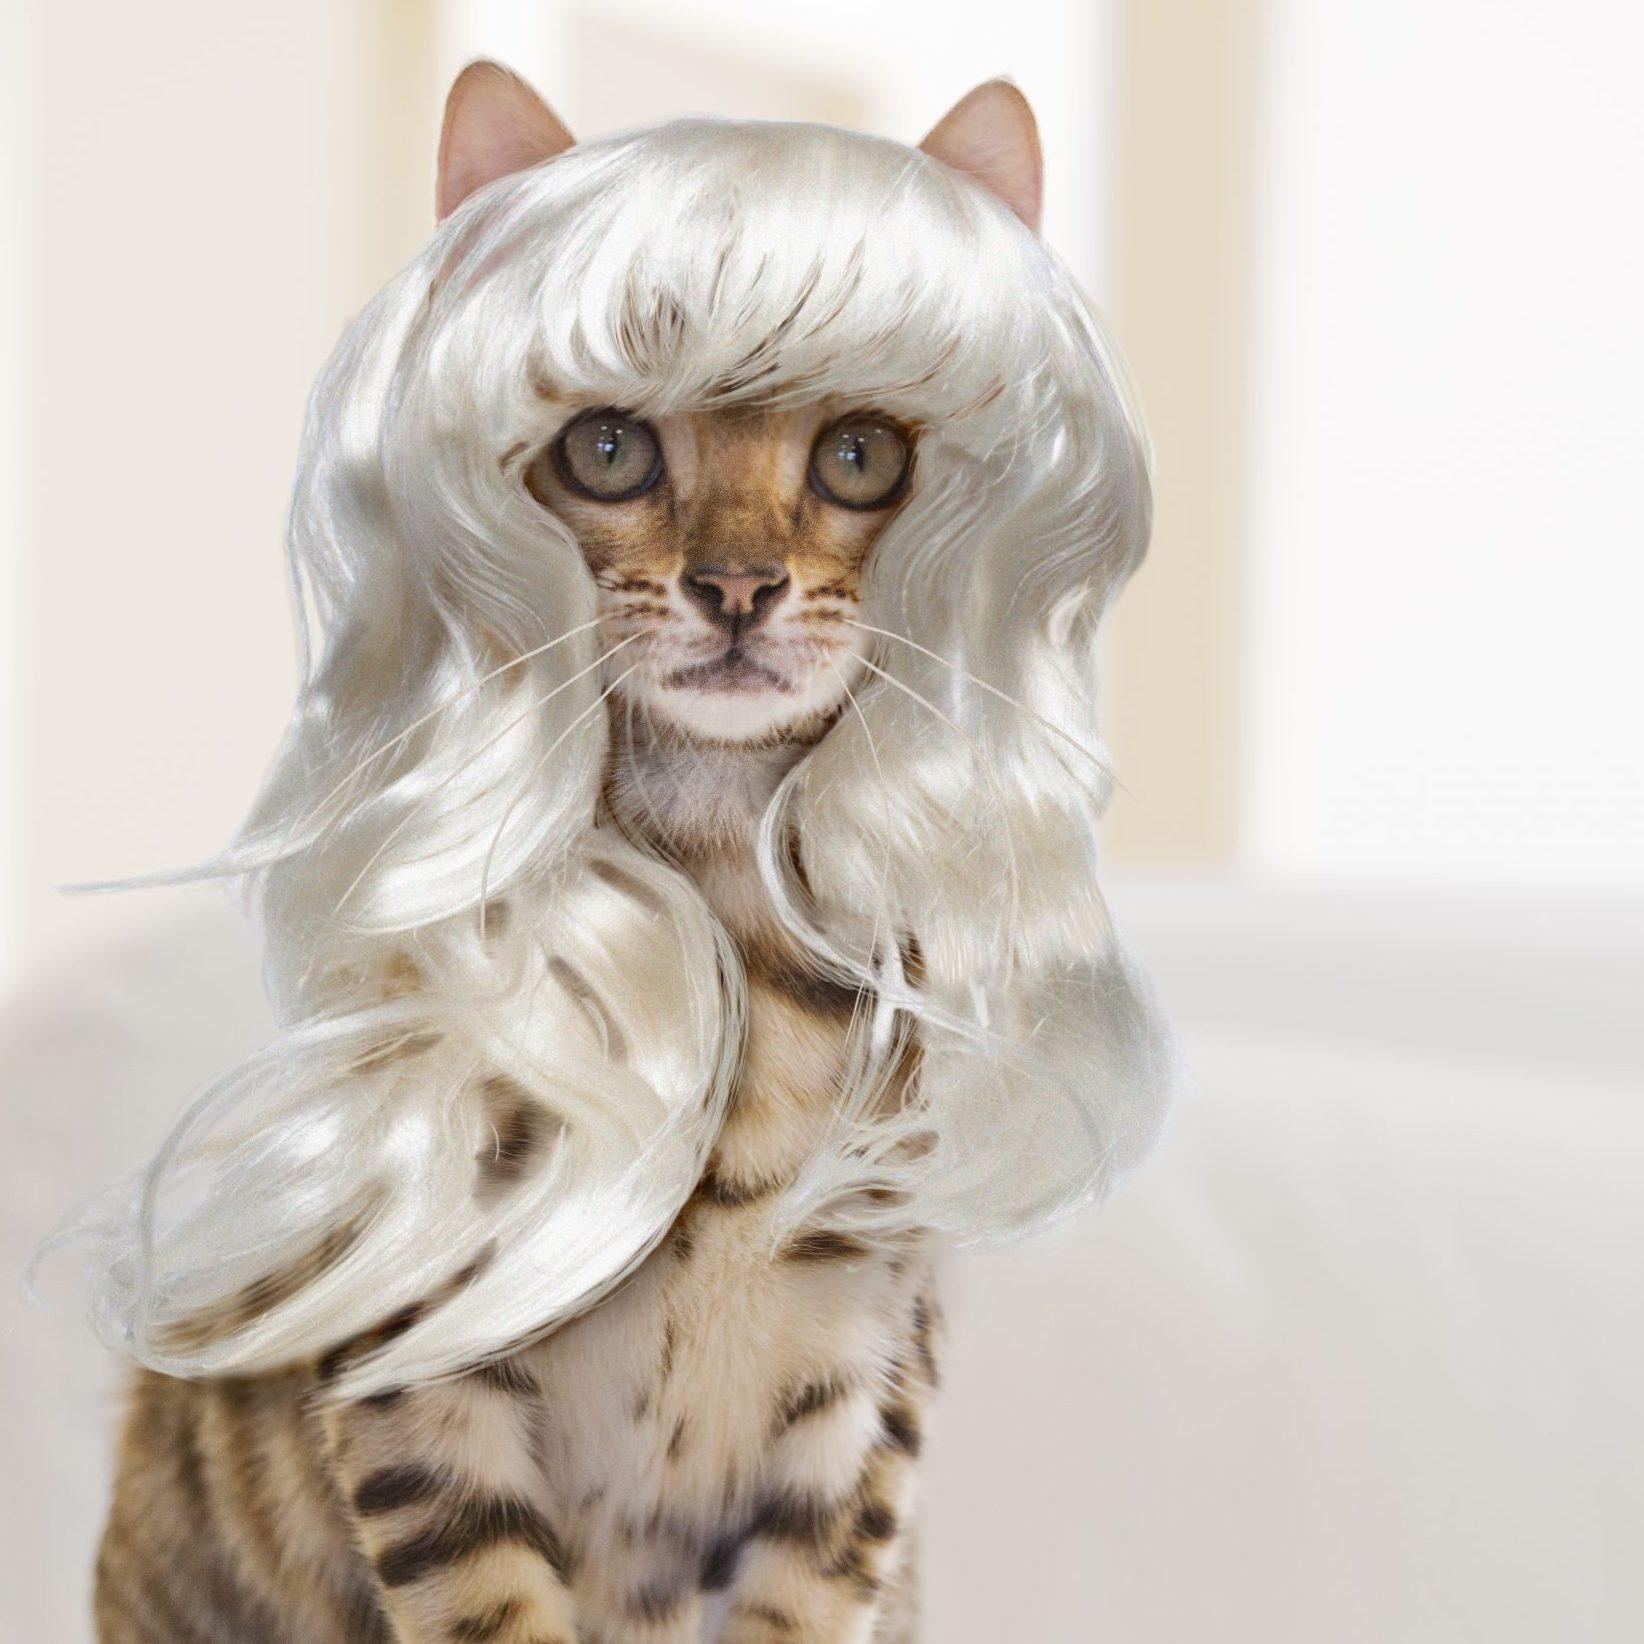 Bengal Cat wearing a Platinum Blonde Wig